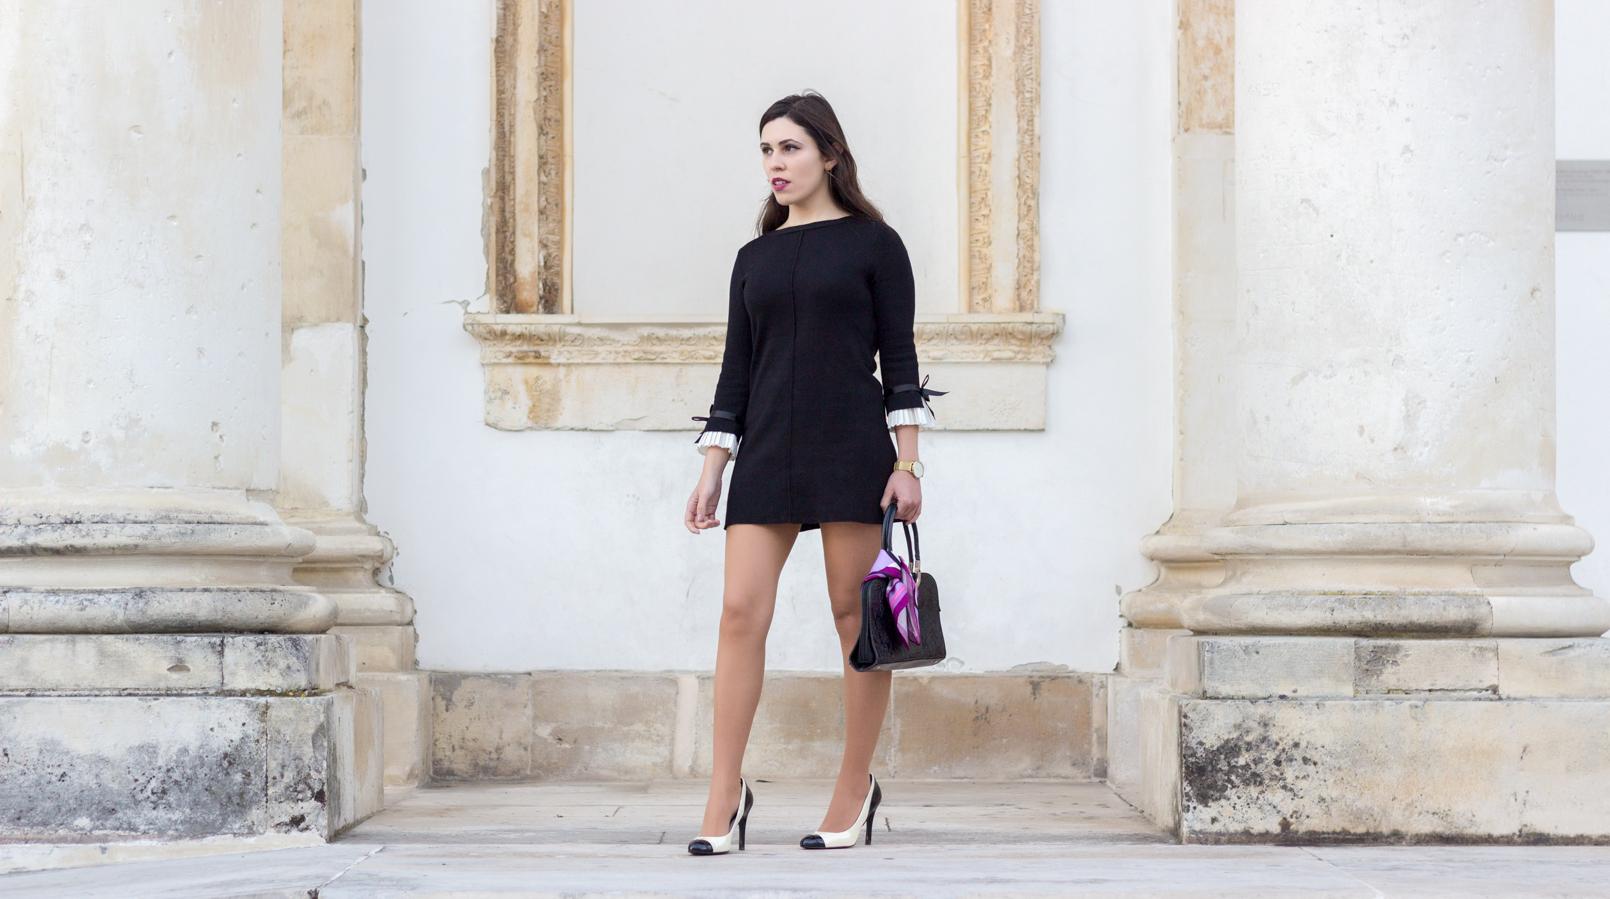 Le Fashionaire Os blogues estão esquecidos? vestido preto mangas brancas laco minusey sapatos pretos brancos estilo chanel zara saltos lenco rosa arabescos estampado emilio pucci 2150F PT